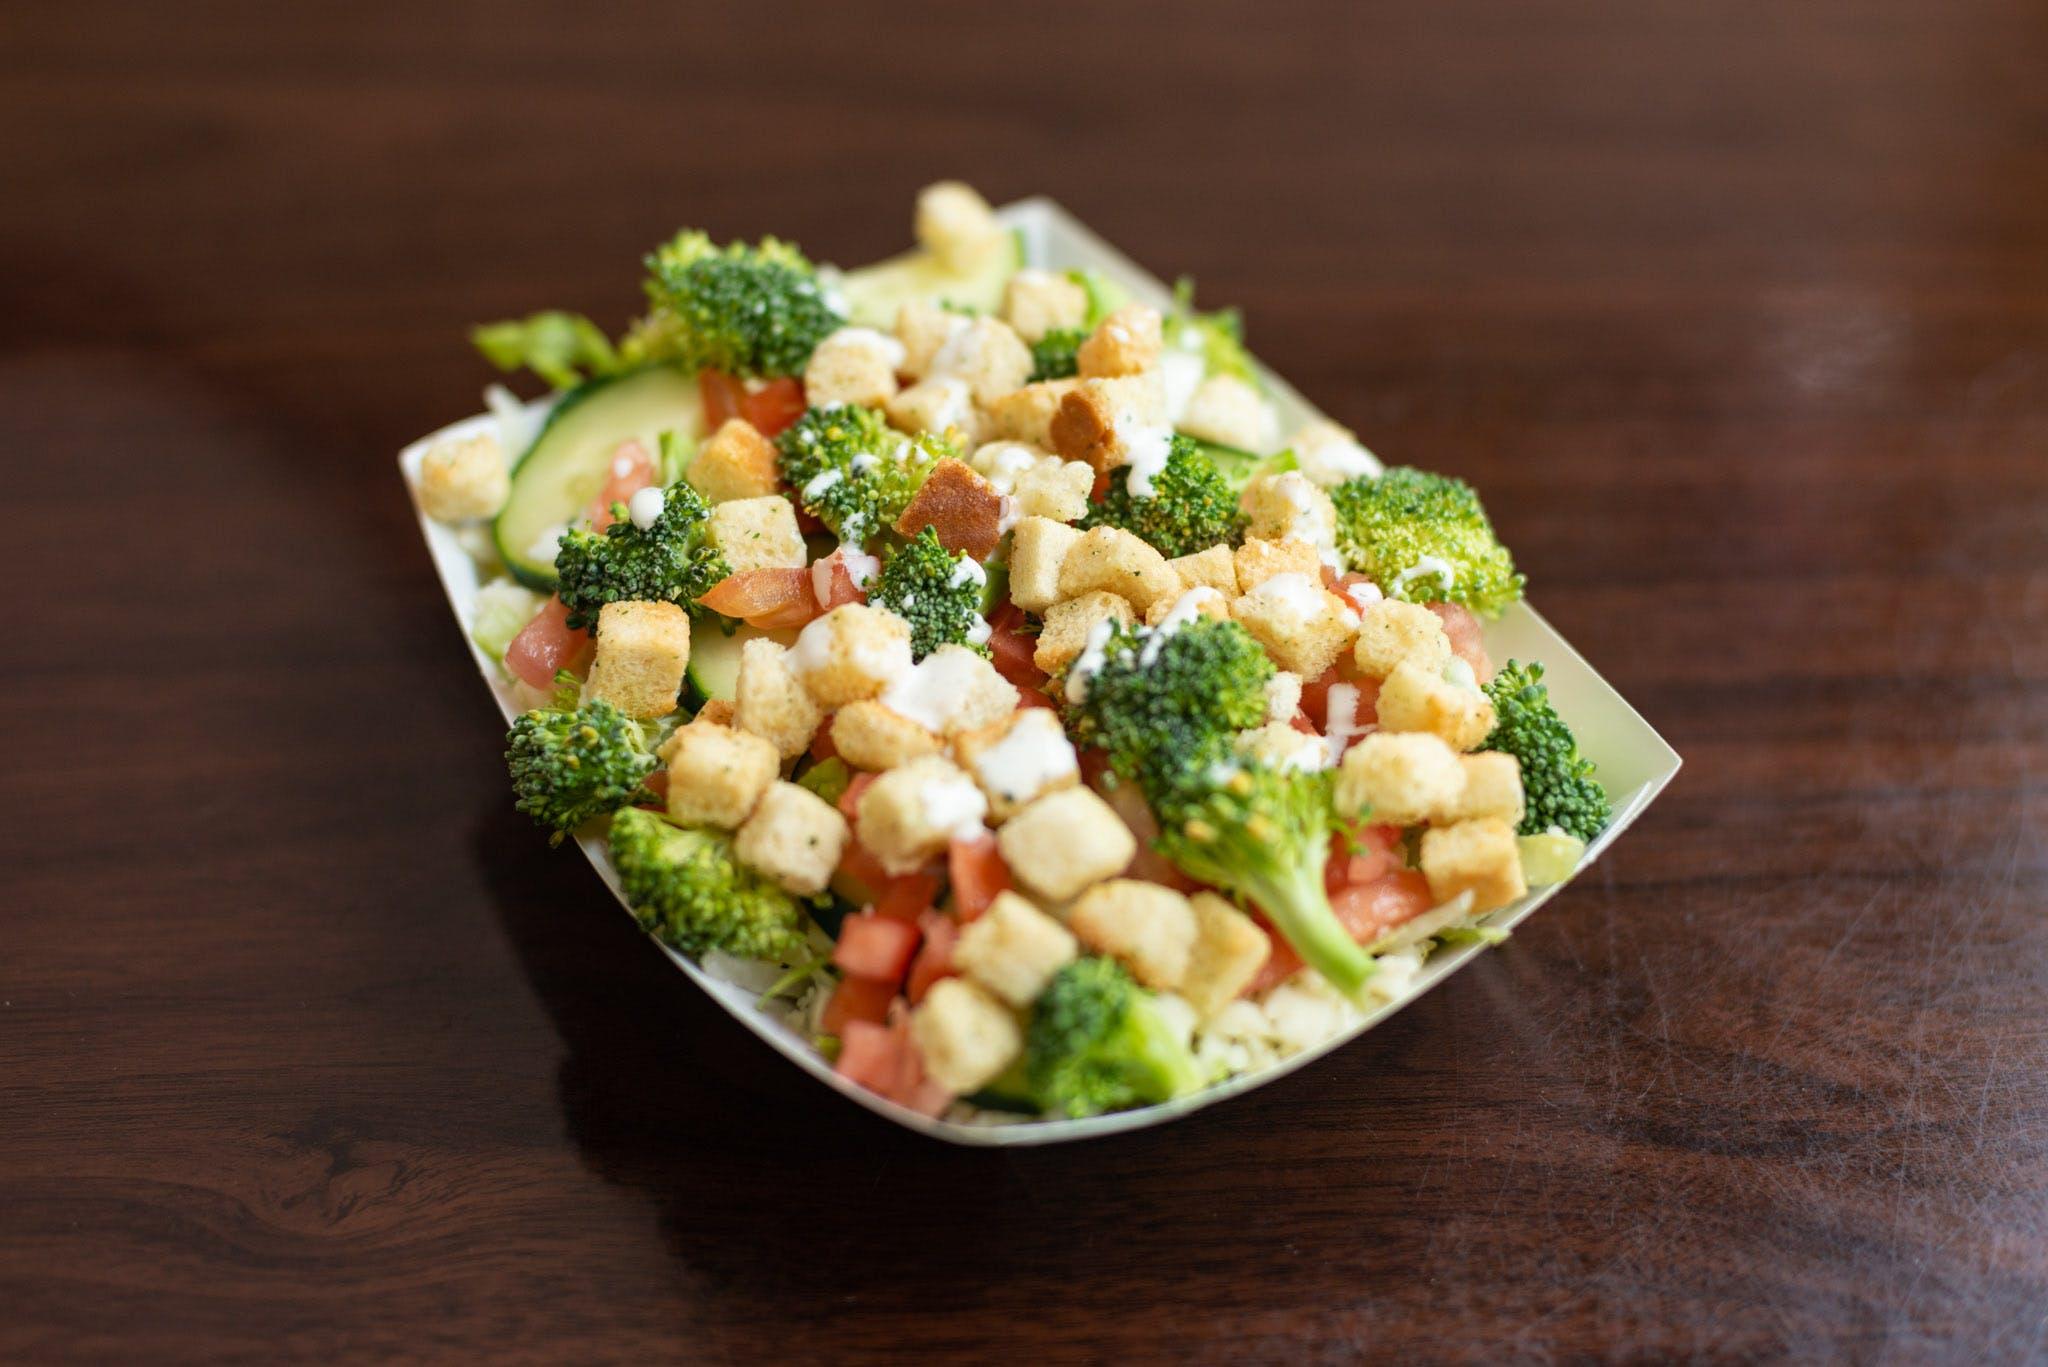 Small Side Salad from Pizza Bob's in Ann Arbor, MI